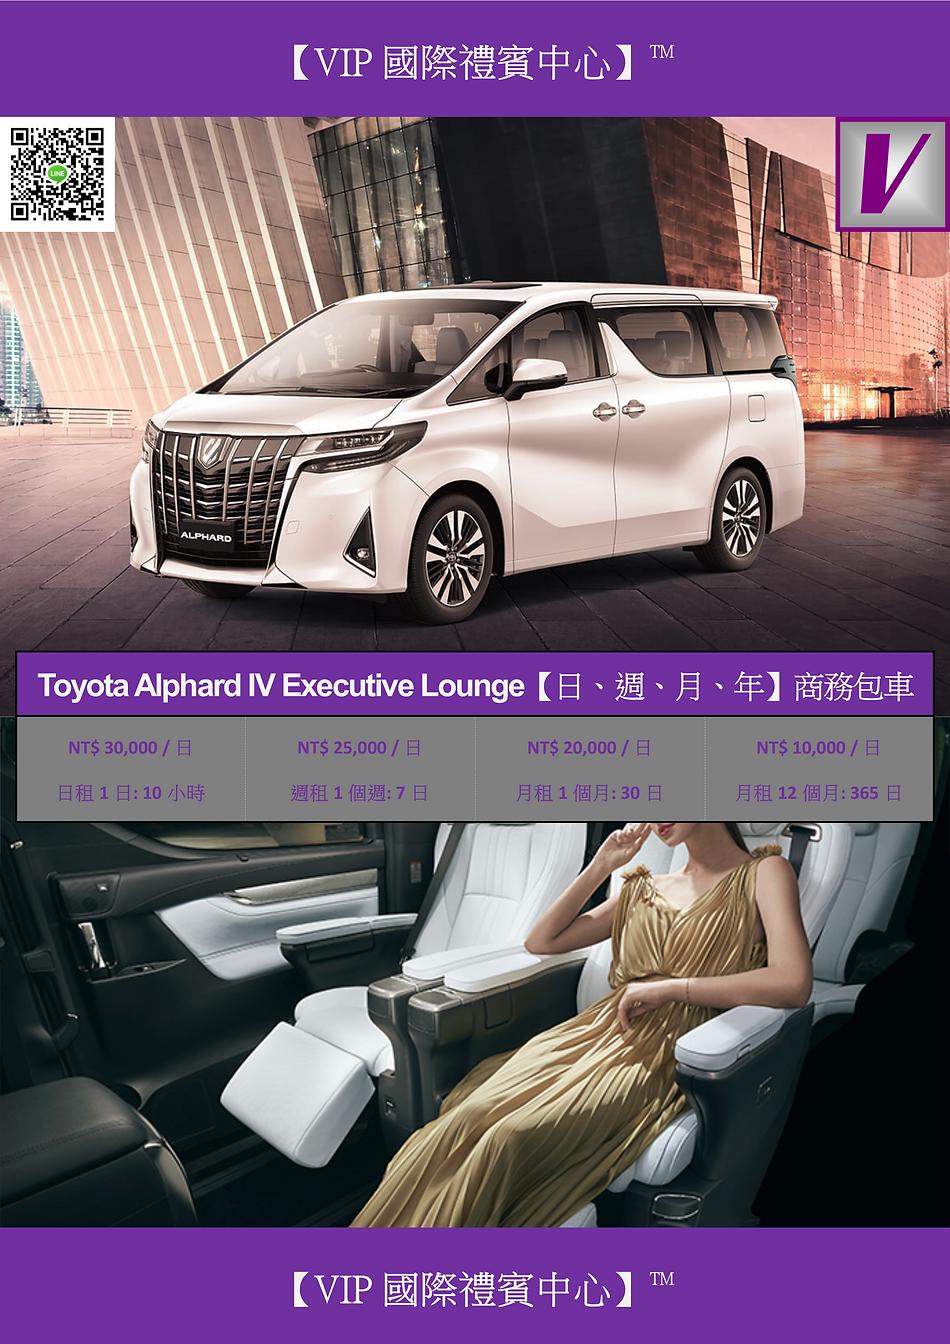 VIP國際禮賓中心 TOYOTA ALPHARD IV EXECUTIVE LOUNGE 中國臺灣接送包車